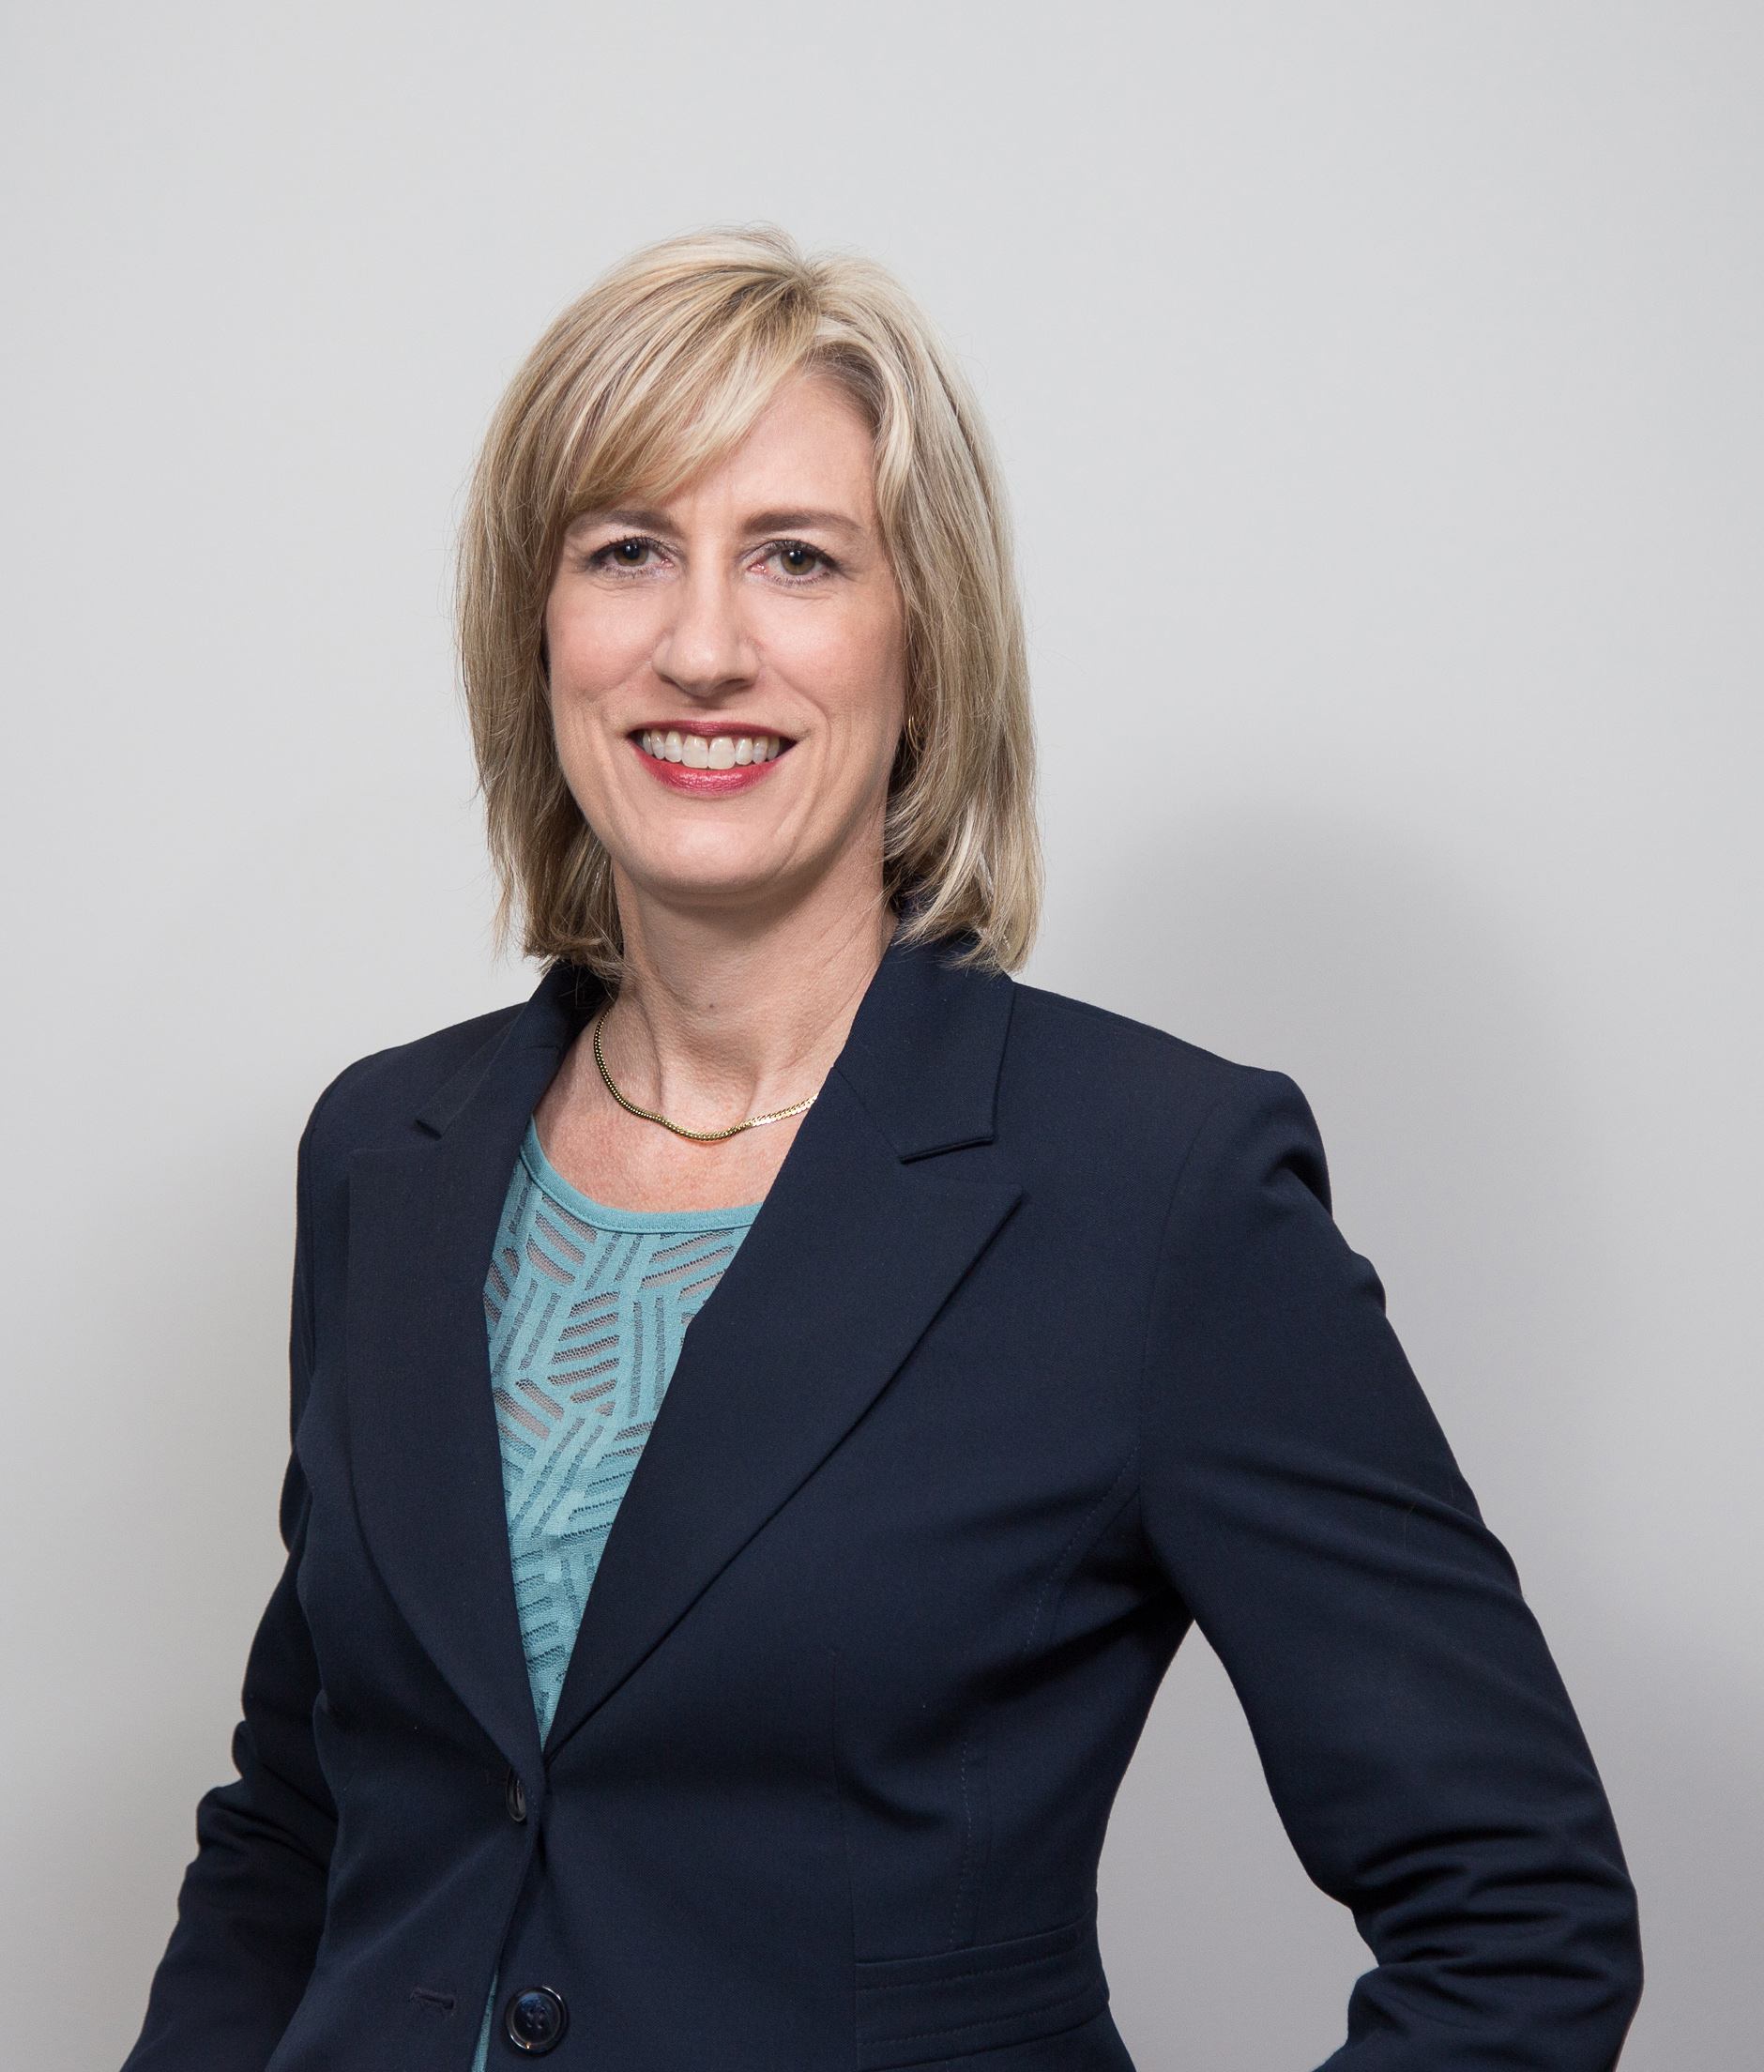 Cynthia Mason - Mason Professional Corporation - Distinctive Women